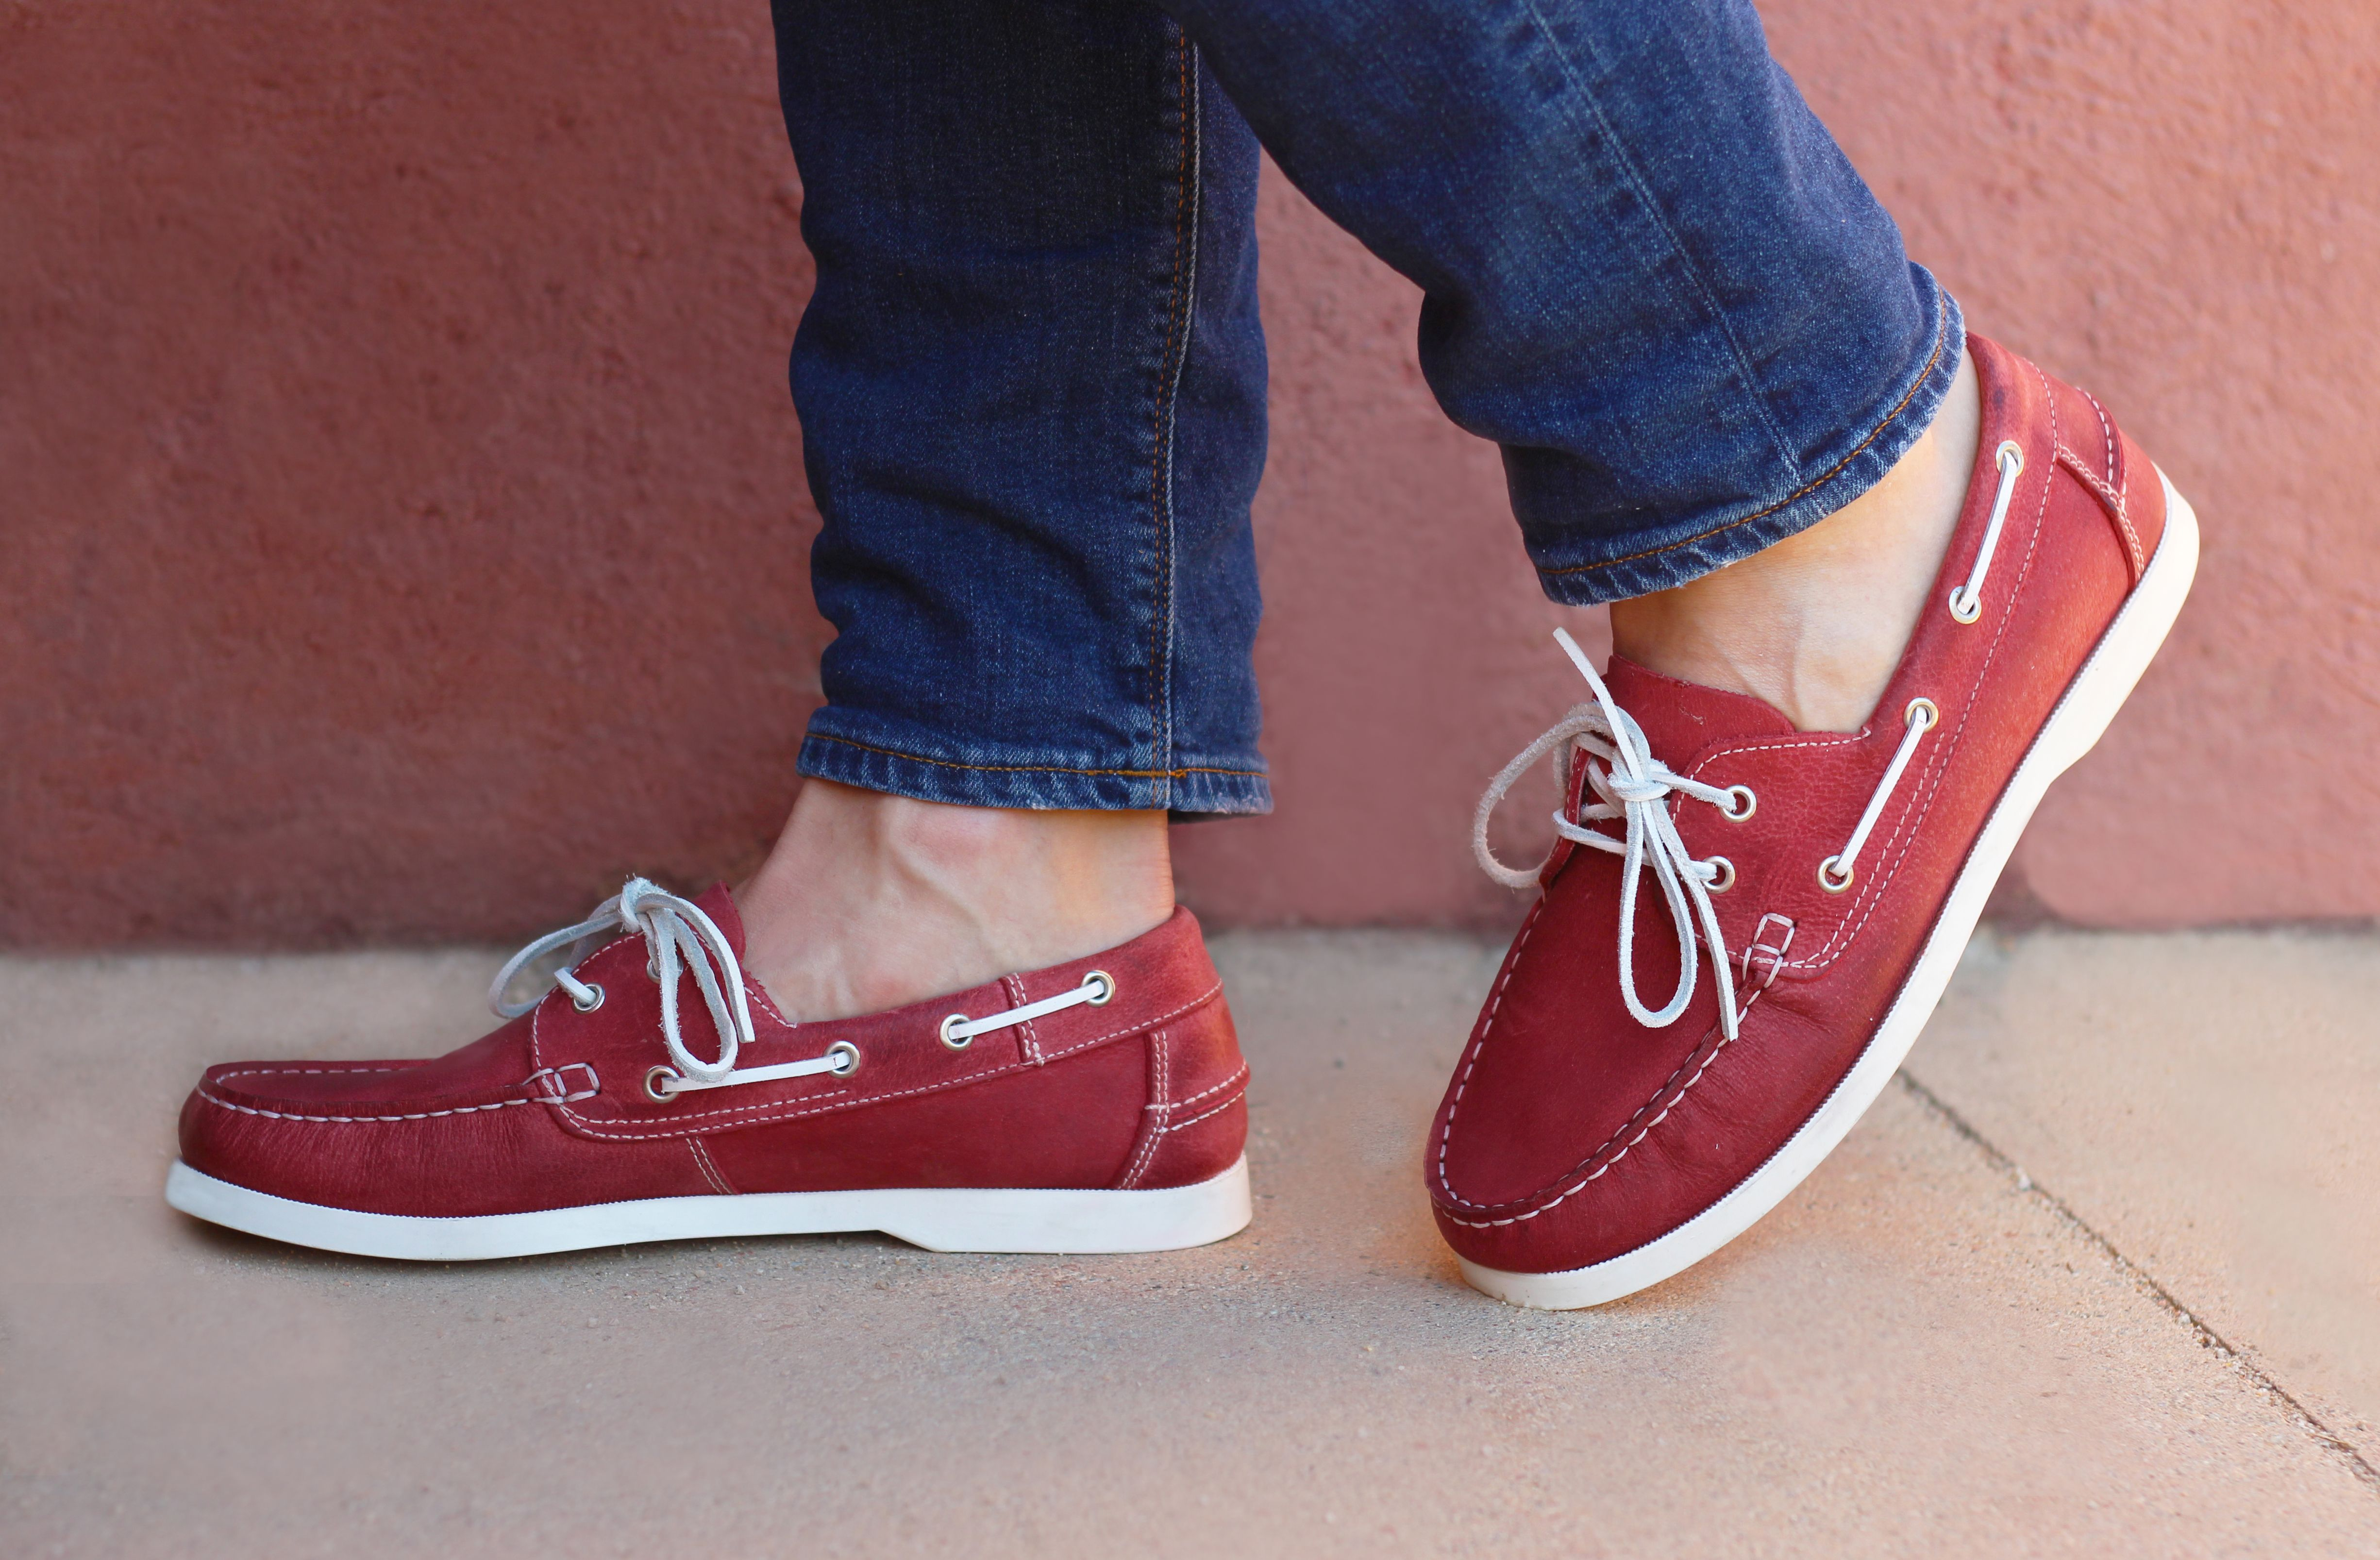 Chaussures bateau homme cuir rouge | Chaussure bateau